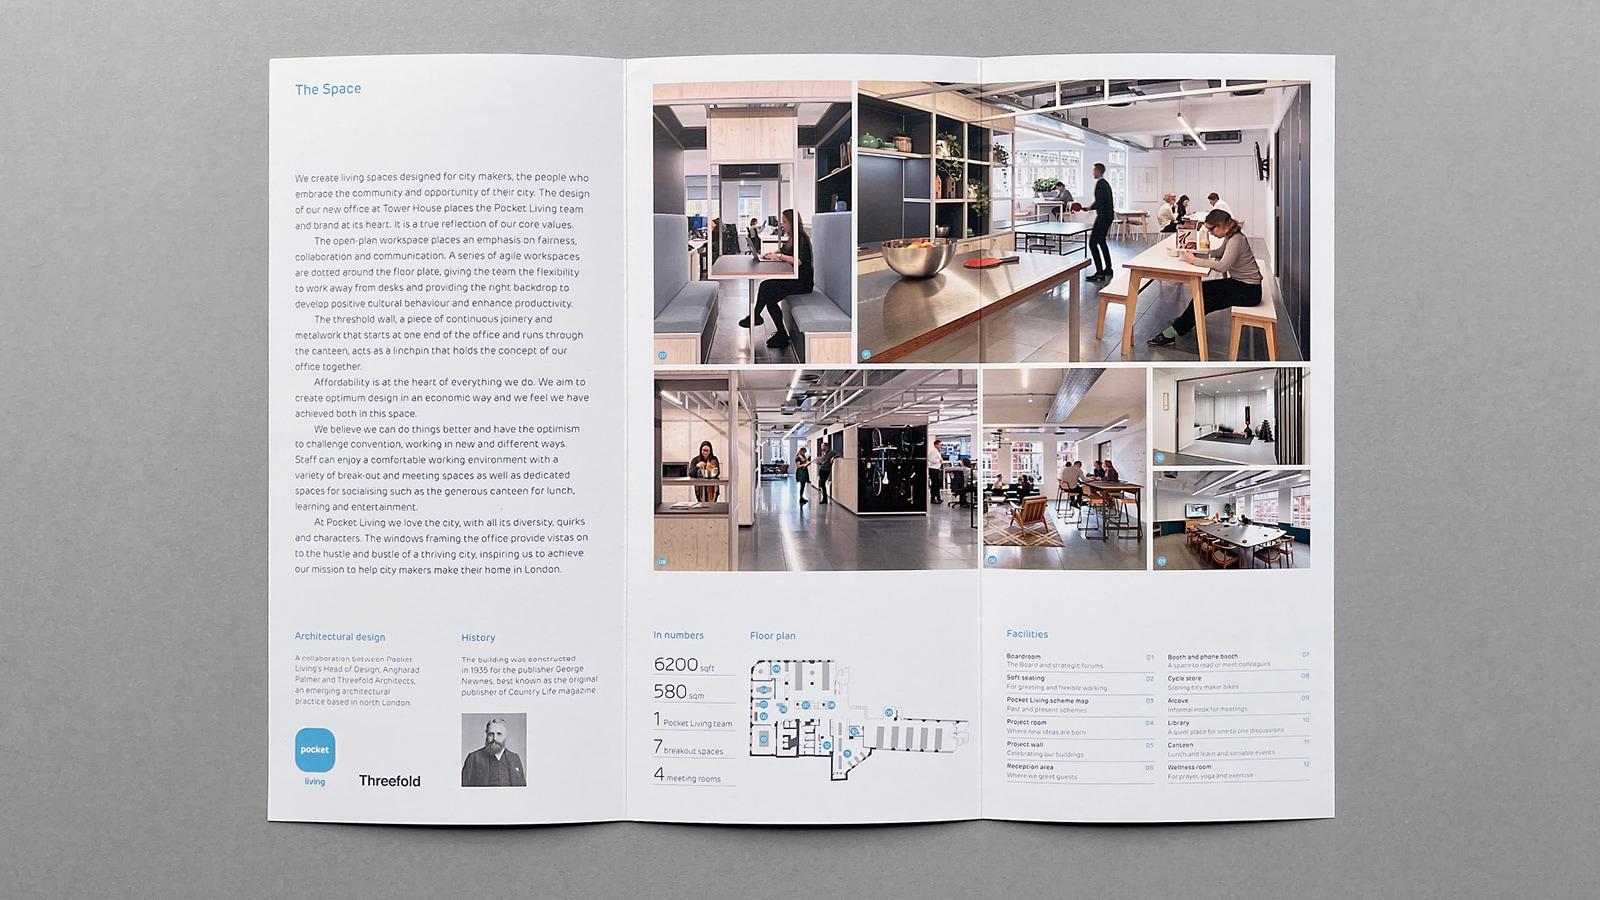 property-marketing-business-communications-branding-graphic-design-milton-keynes-london153